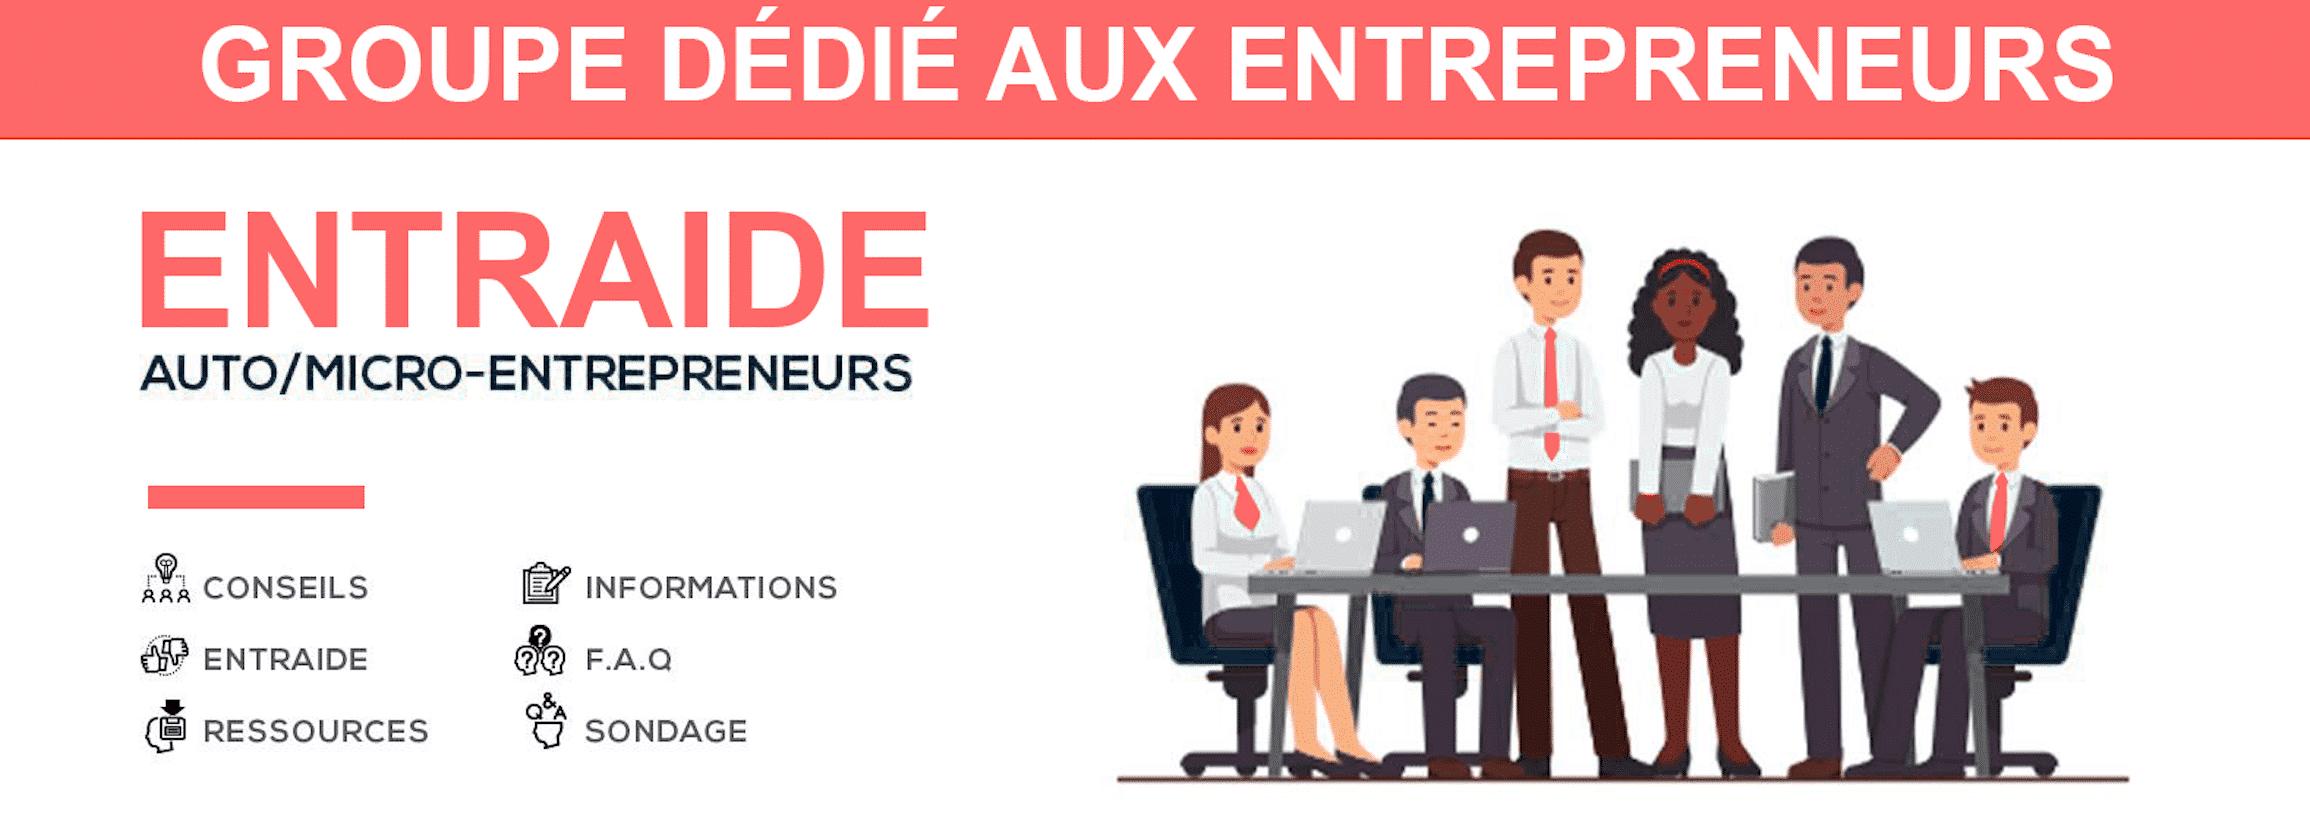 entraide auto-micro-entrepreneurs